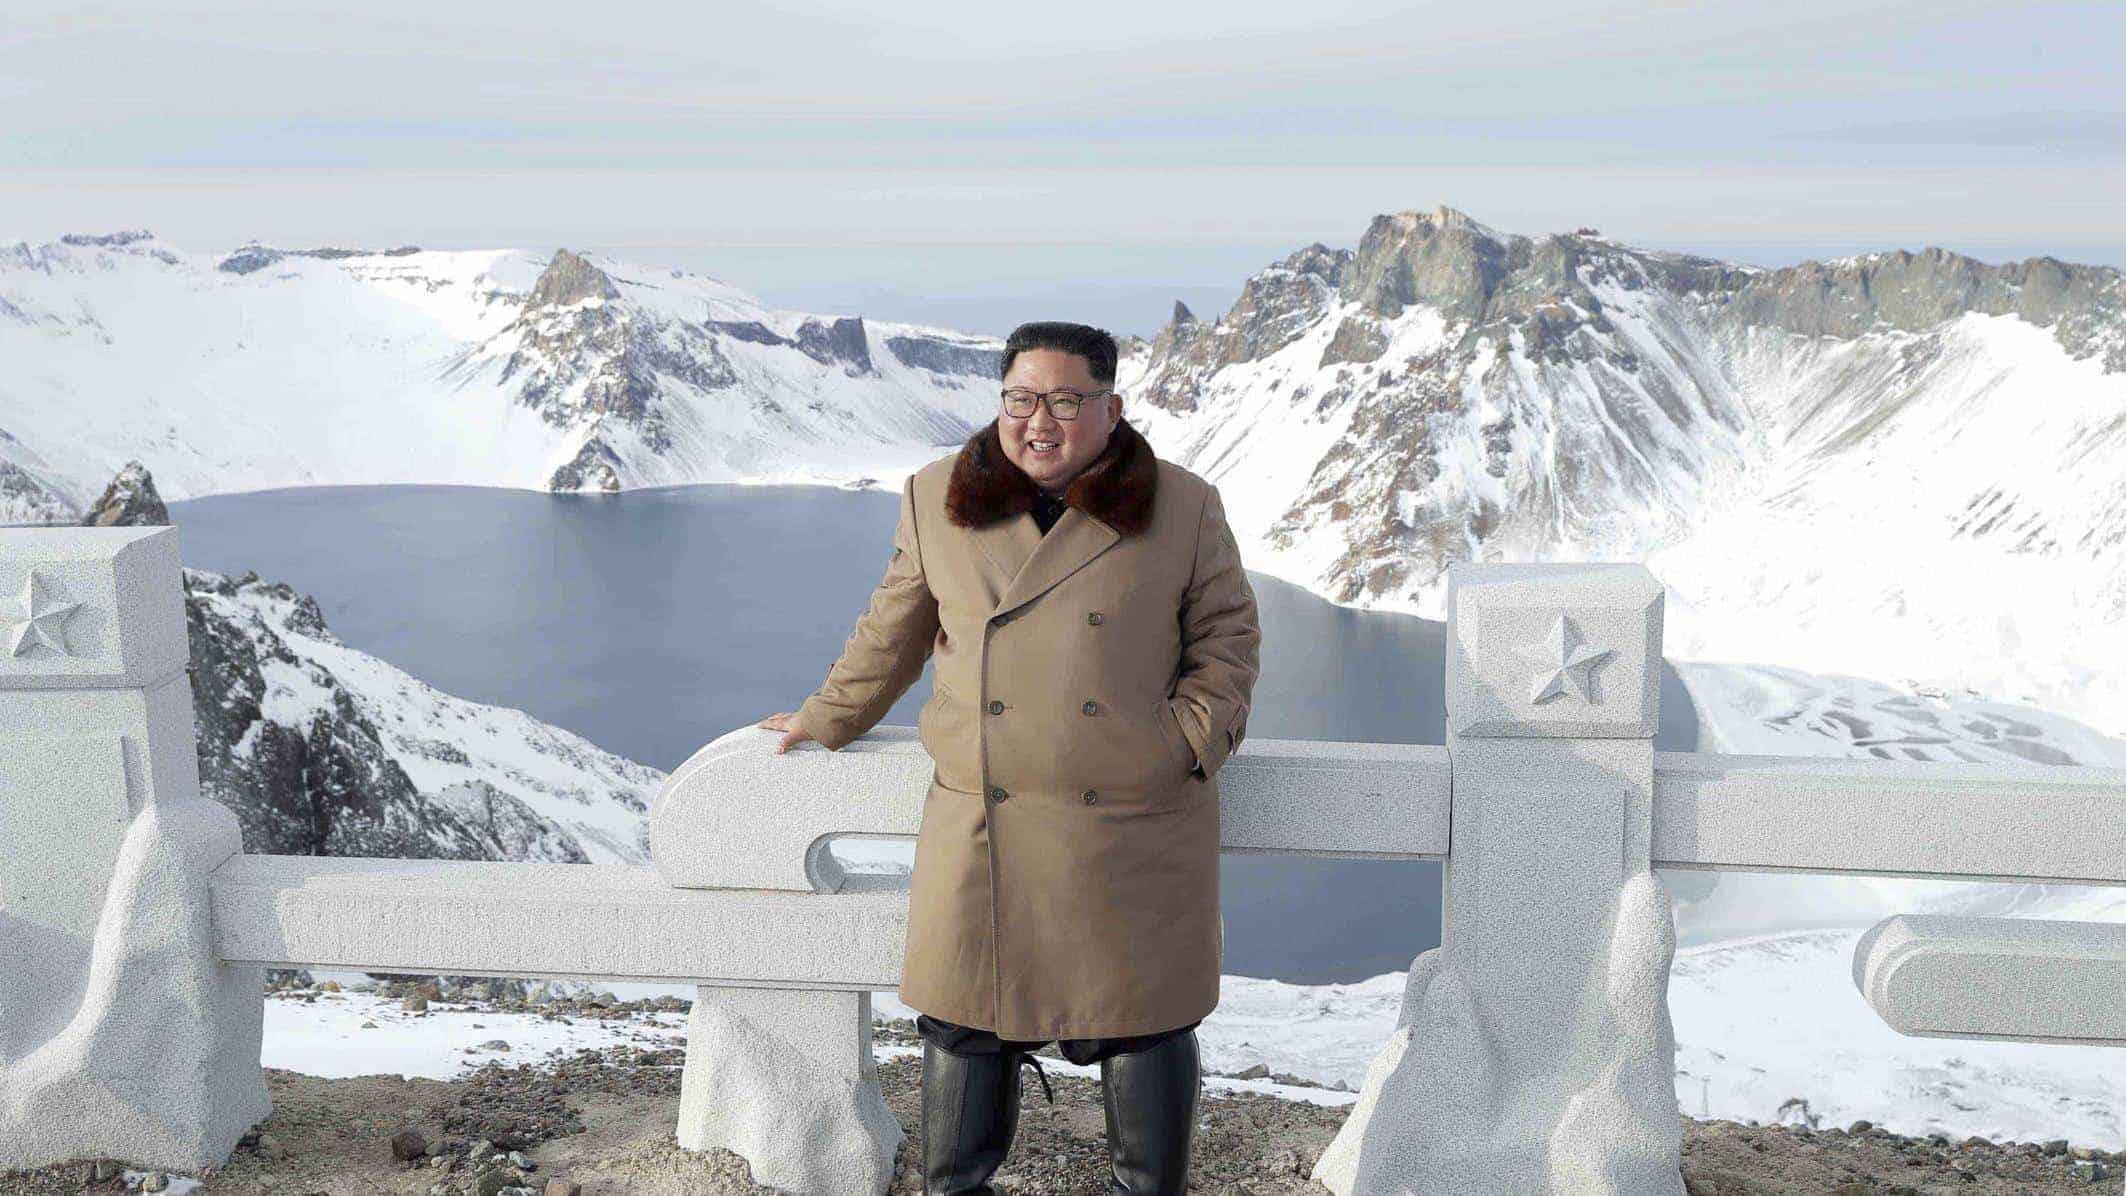 north korea threatens to resume calling trump  u2018a dotard u2019